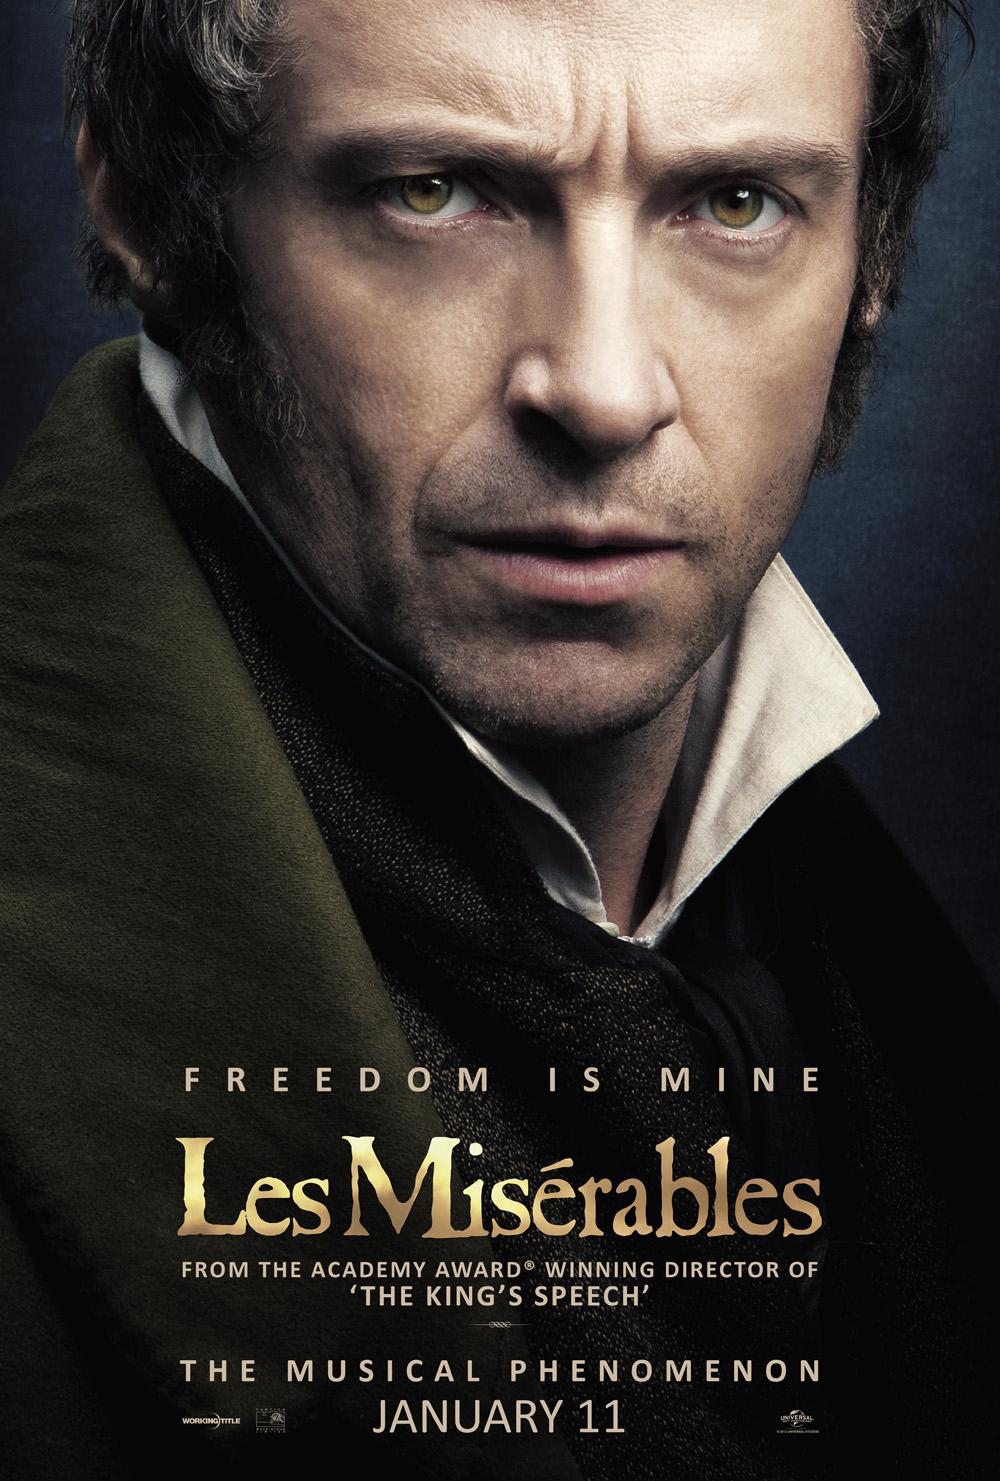 Les Miserables - Movie Poster #2 (Original)